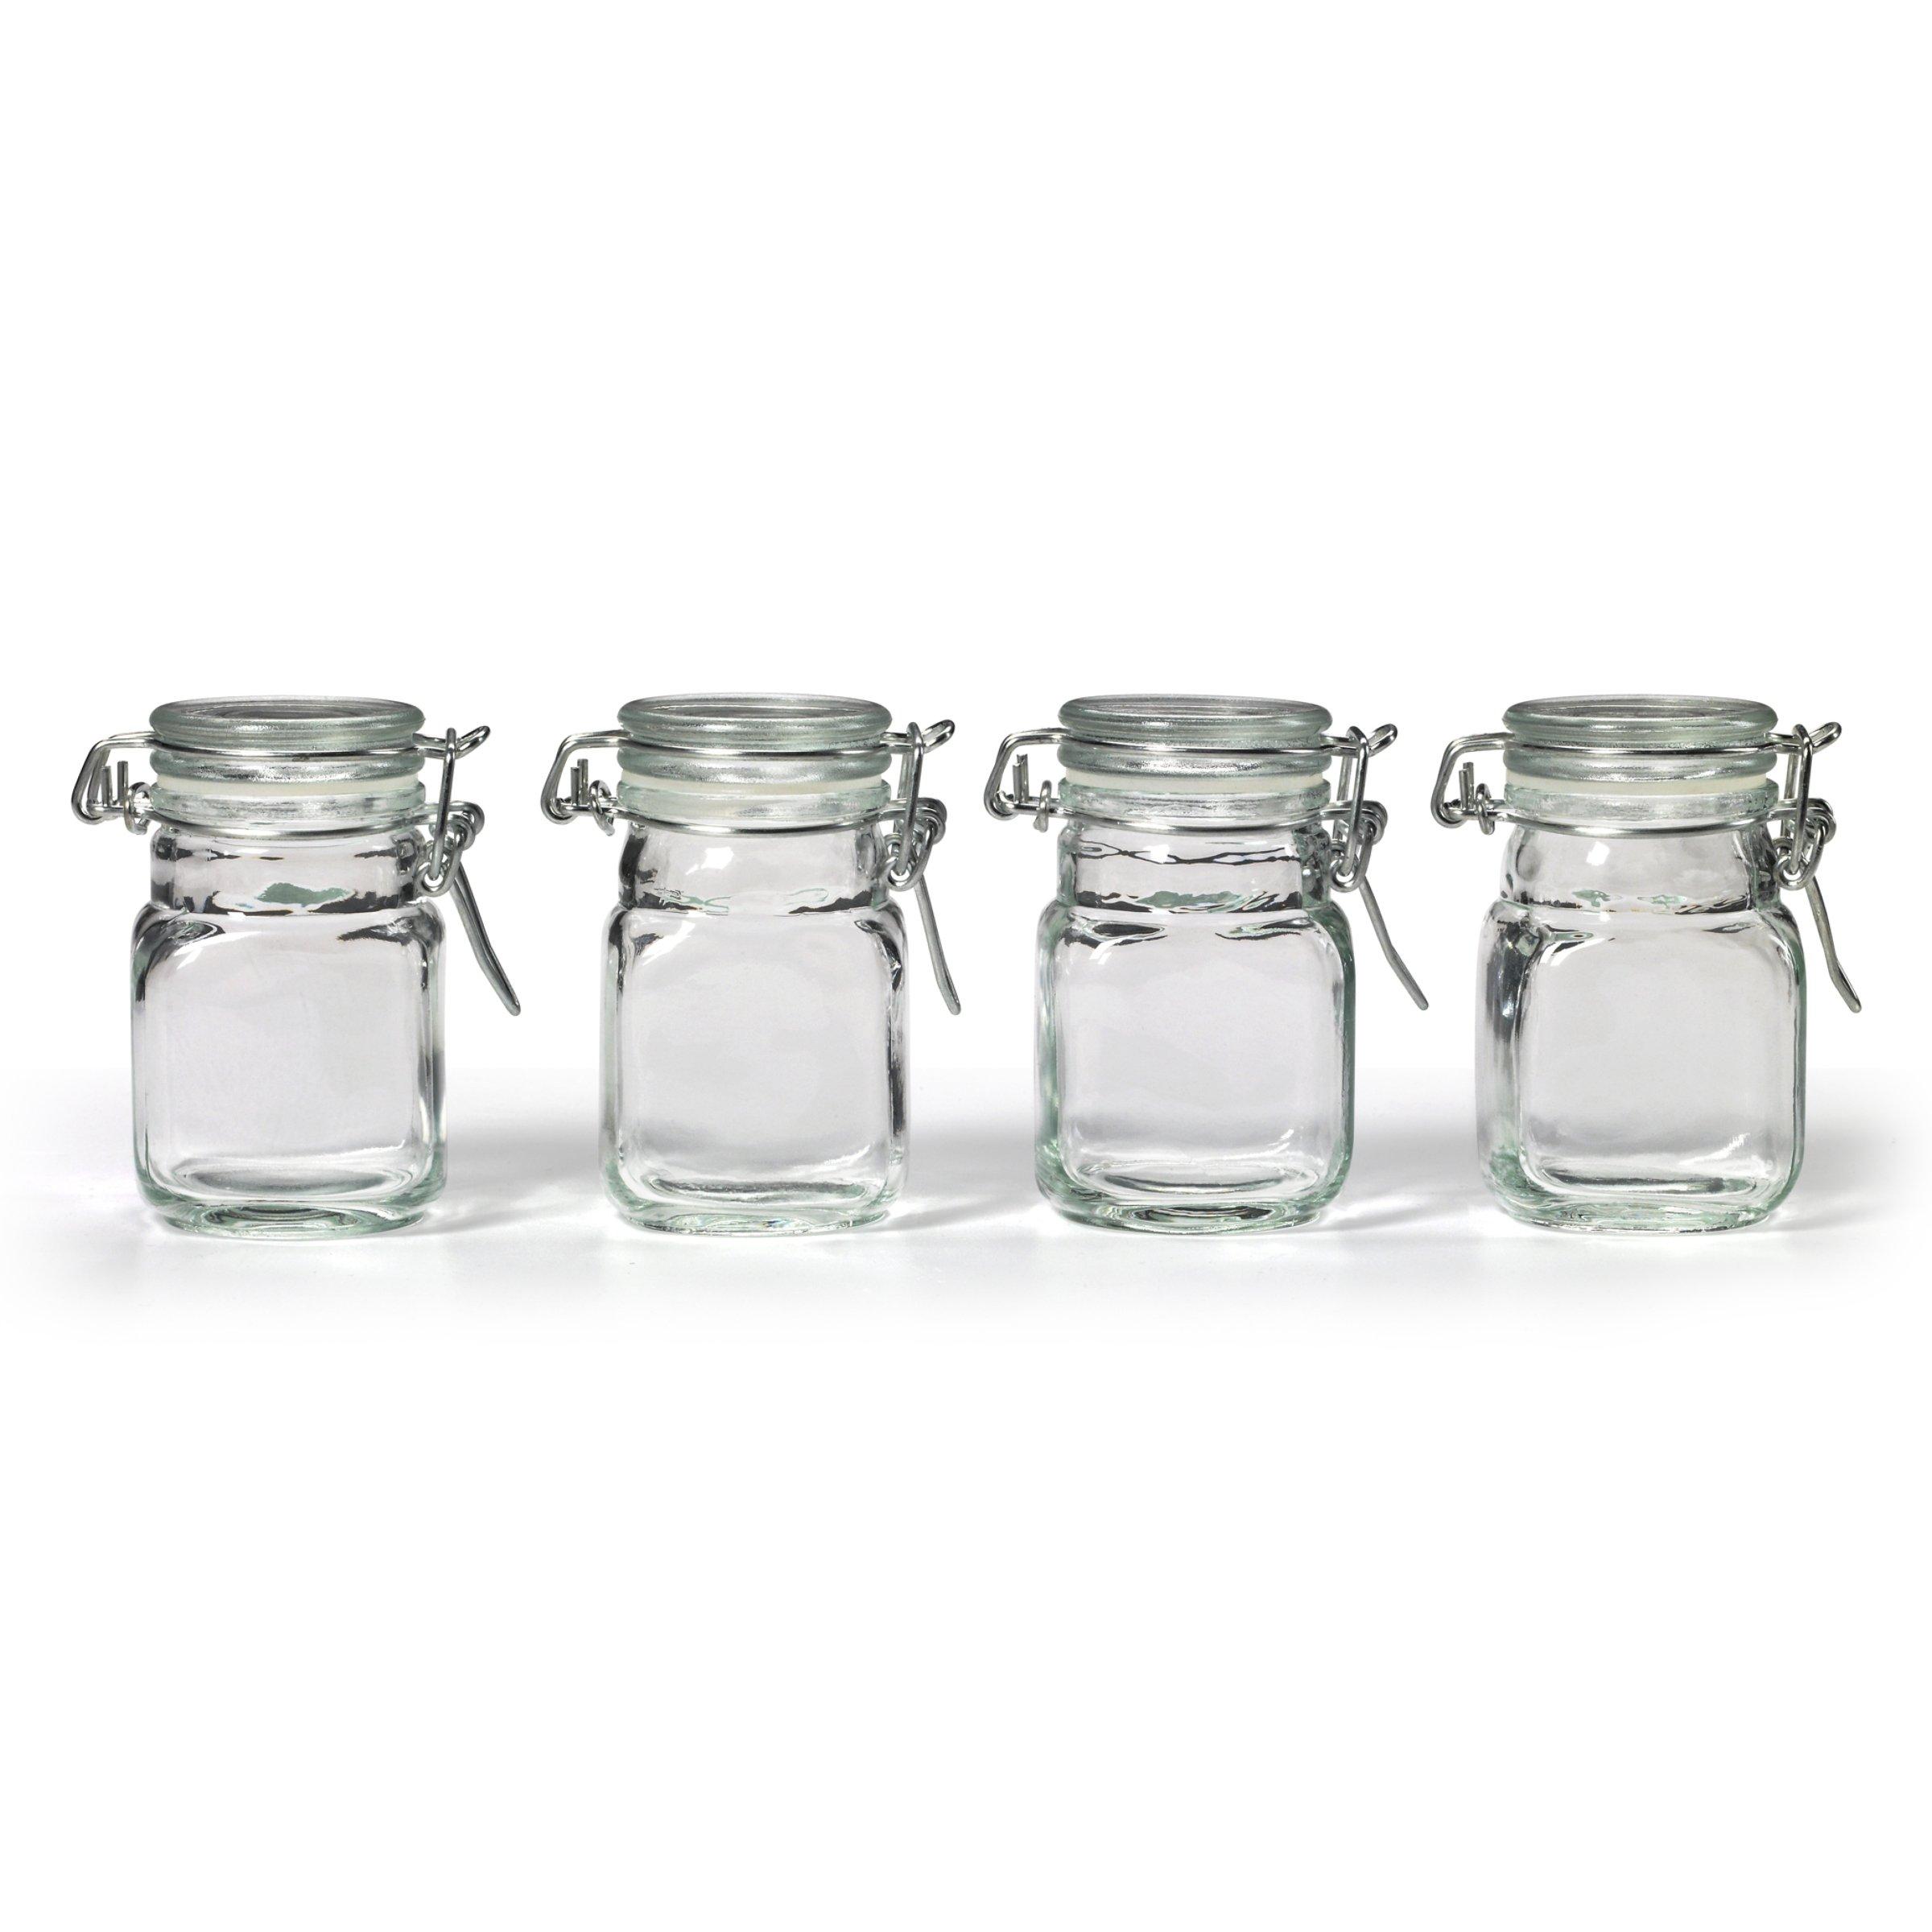 New Square Glass Jar Hinge Lid Set 4 Piece Kitchen